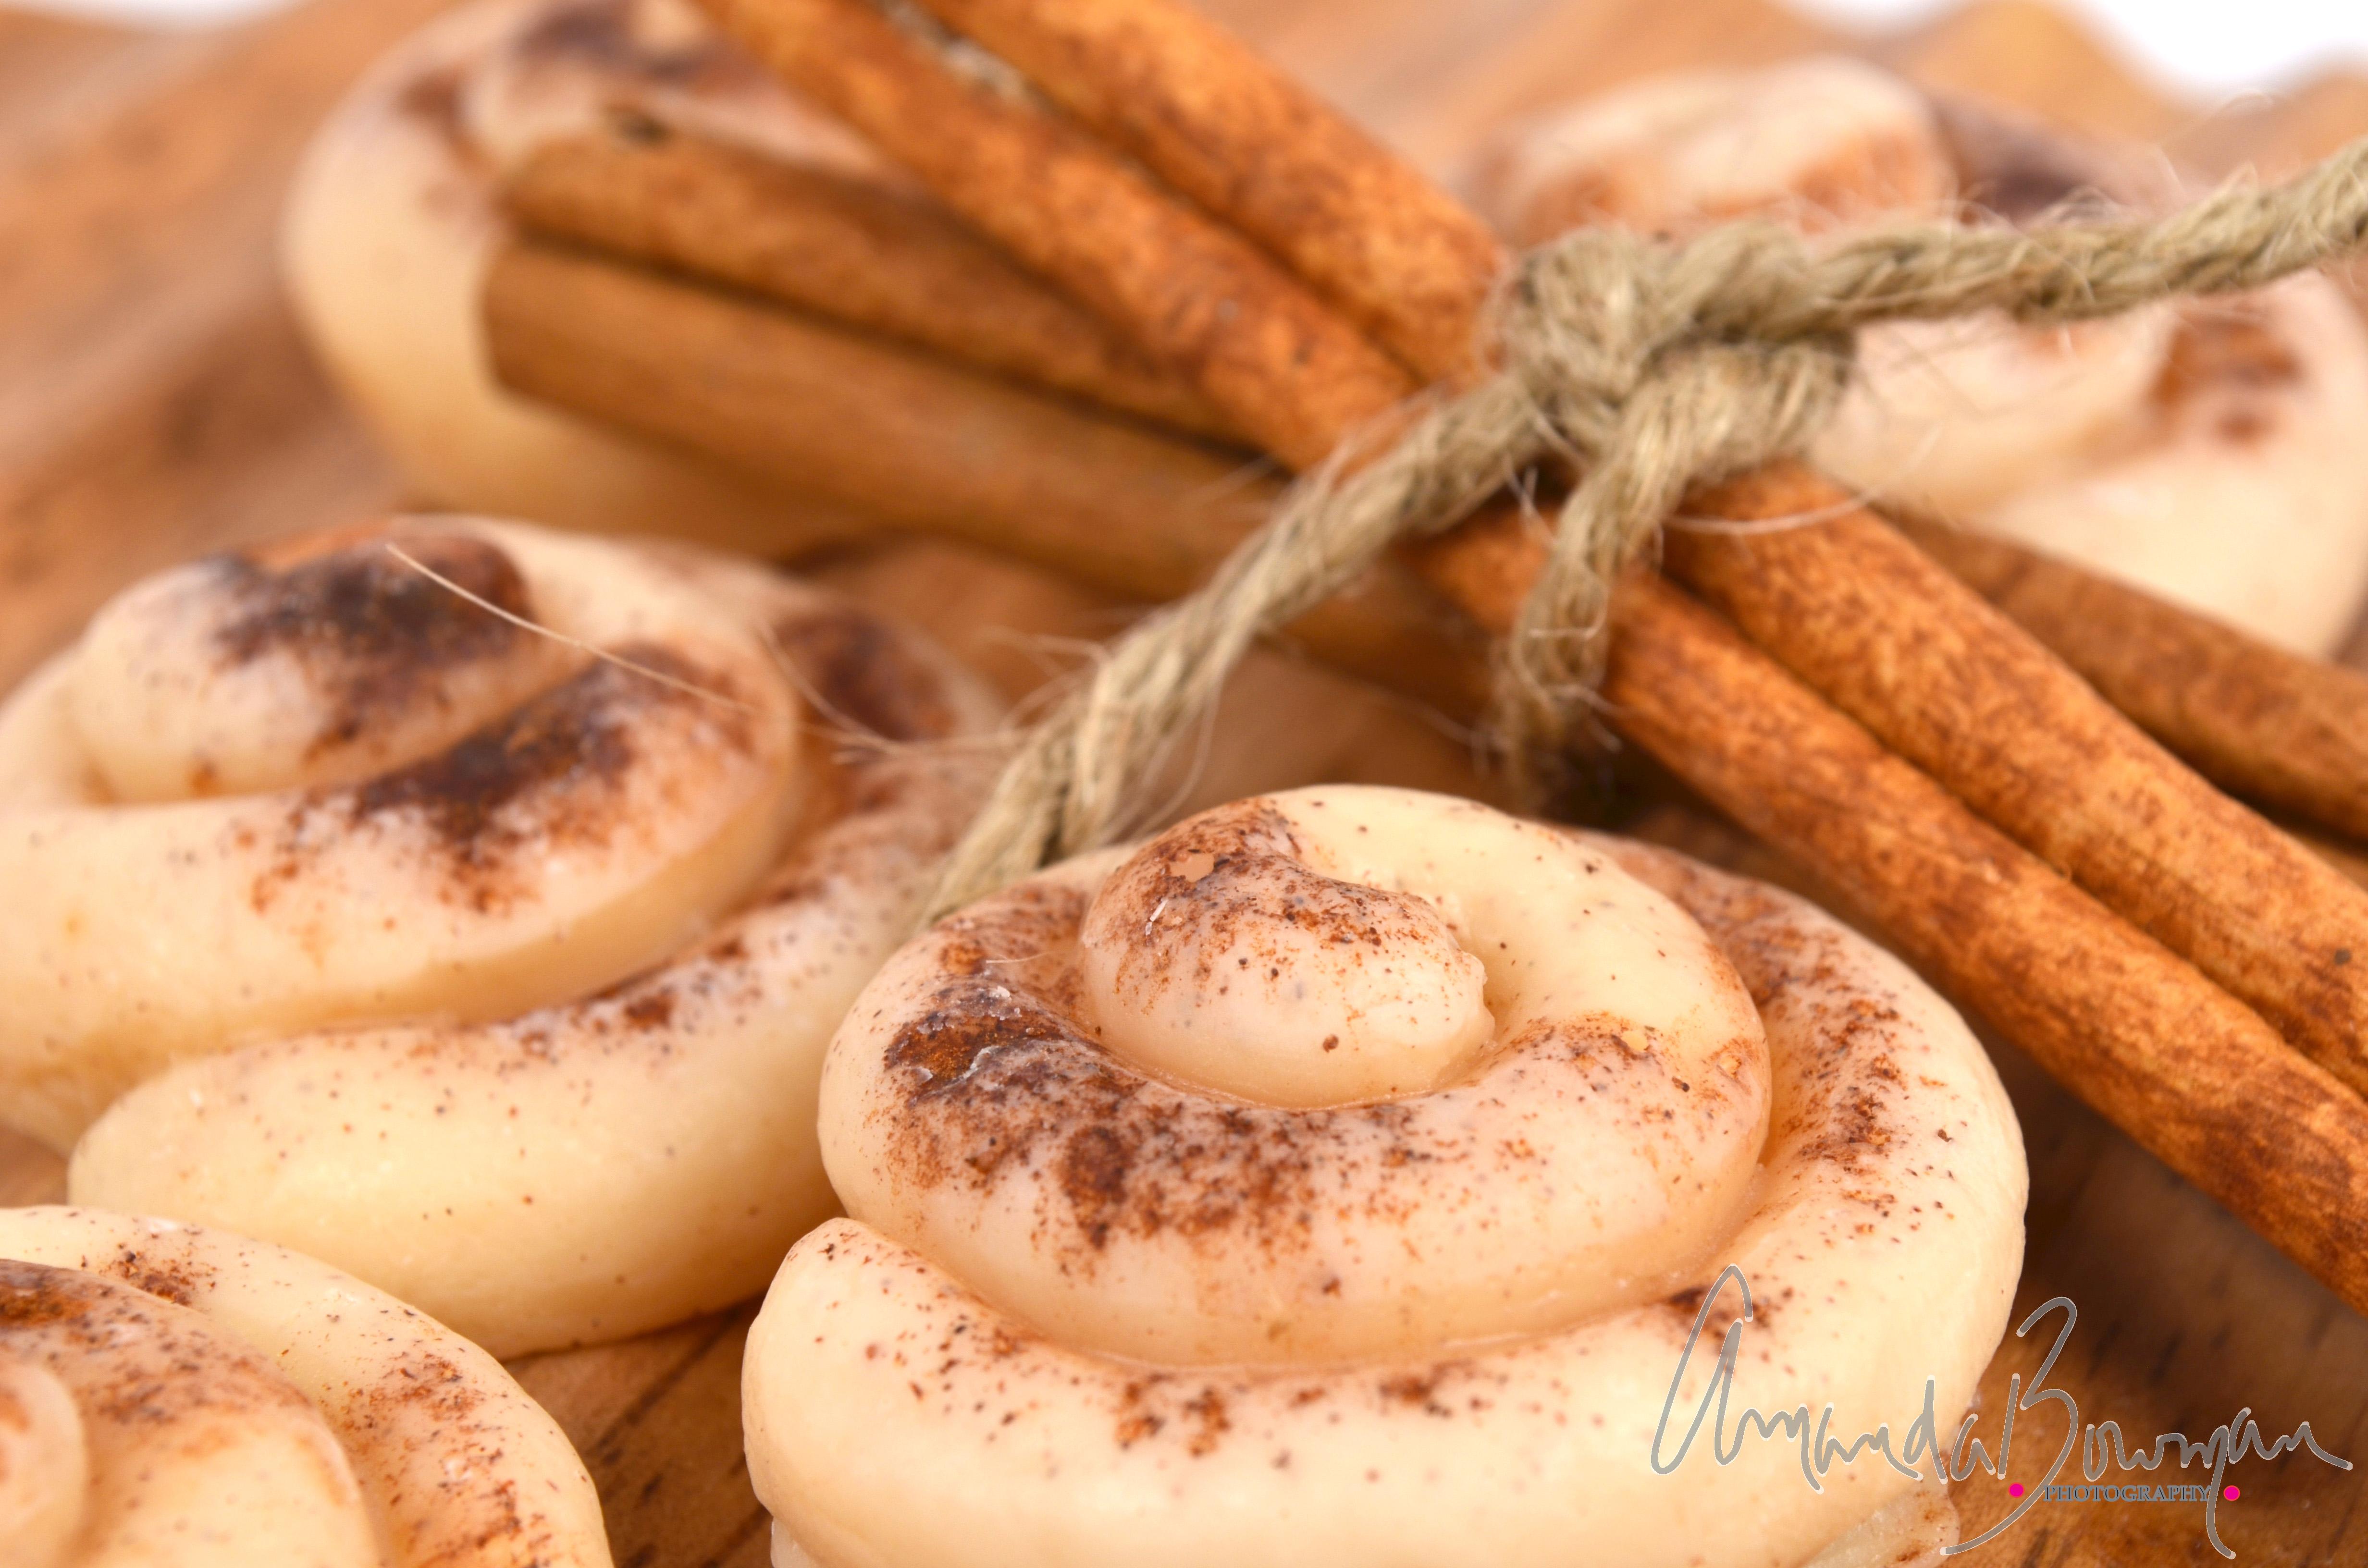 Small Cinnamon Bun Wax Melts